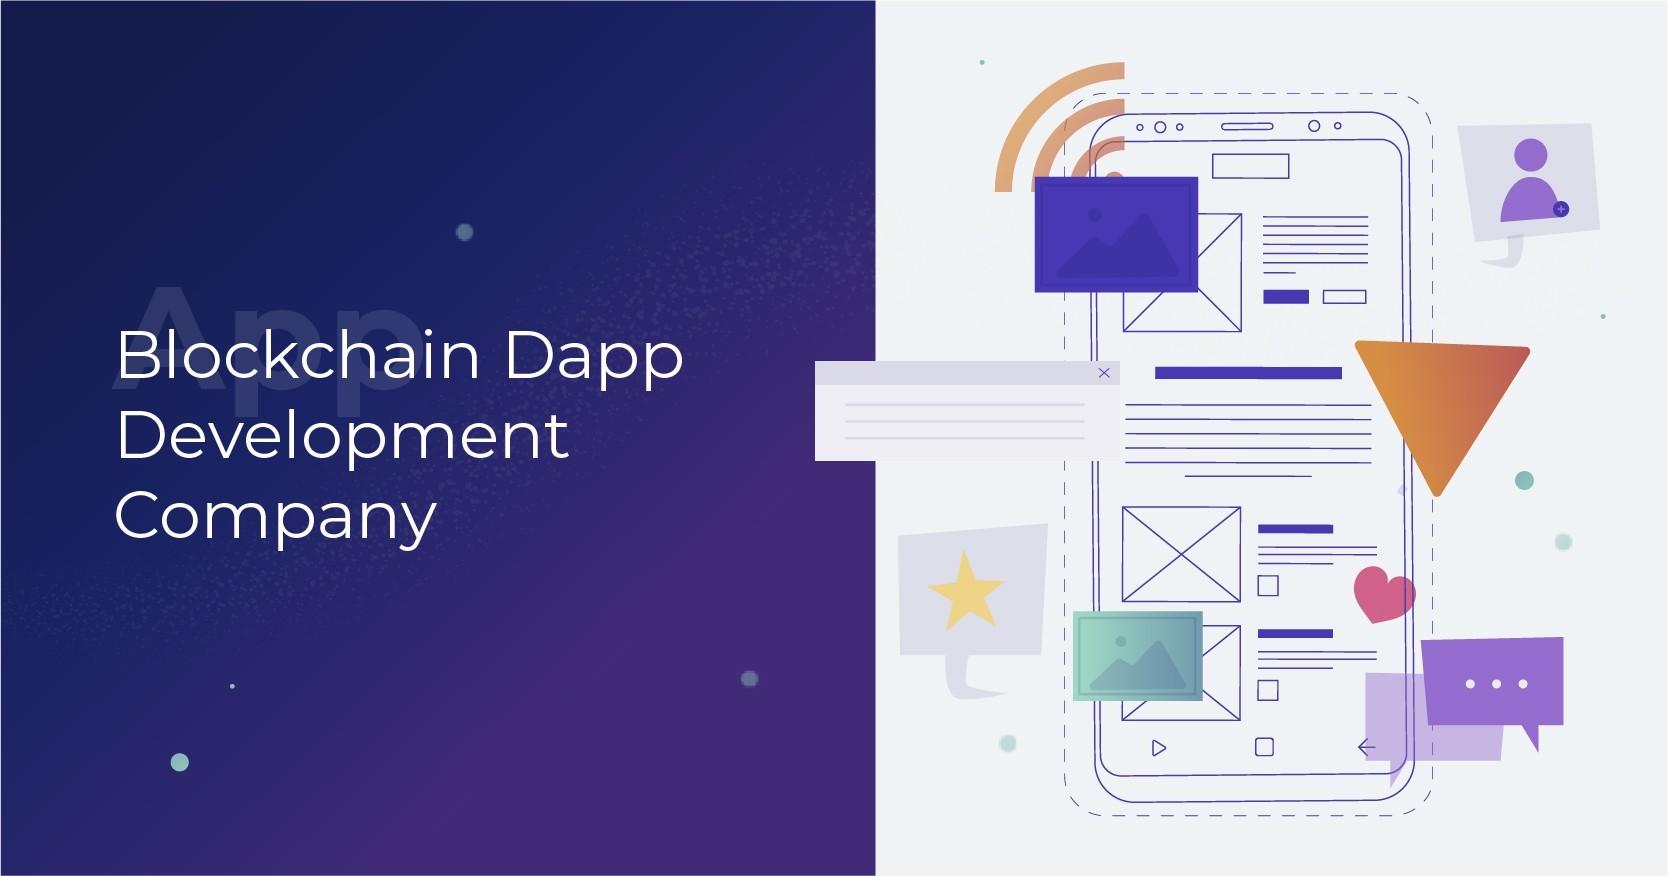 Blockchain Dapps Development Company